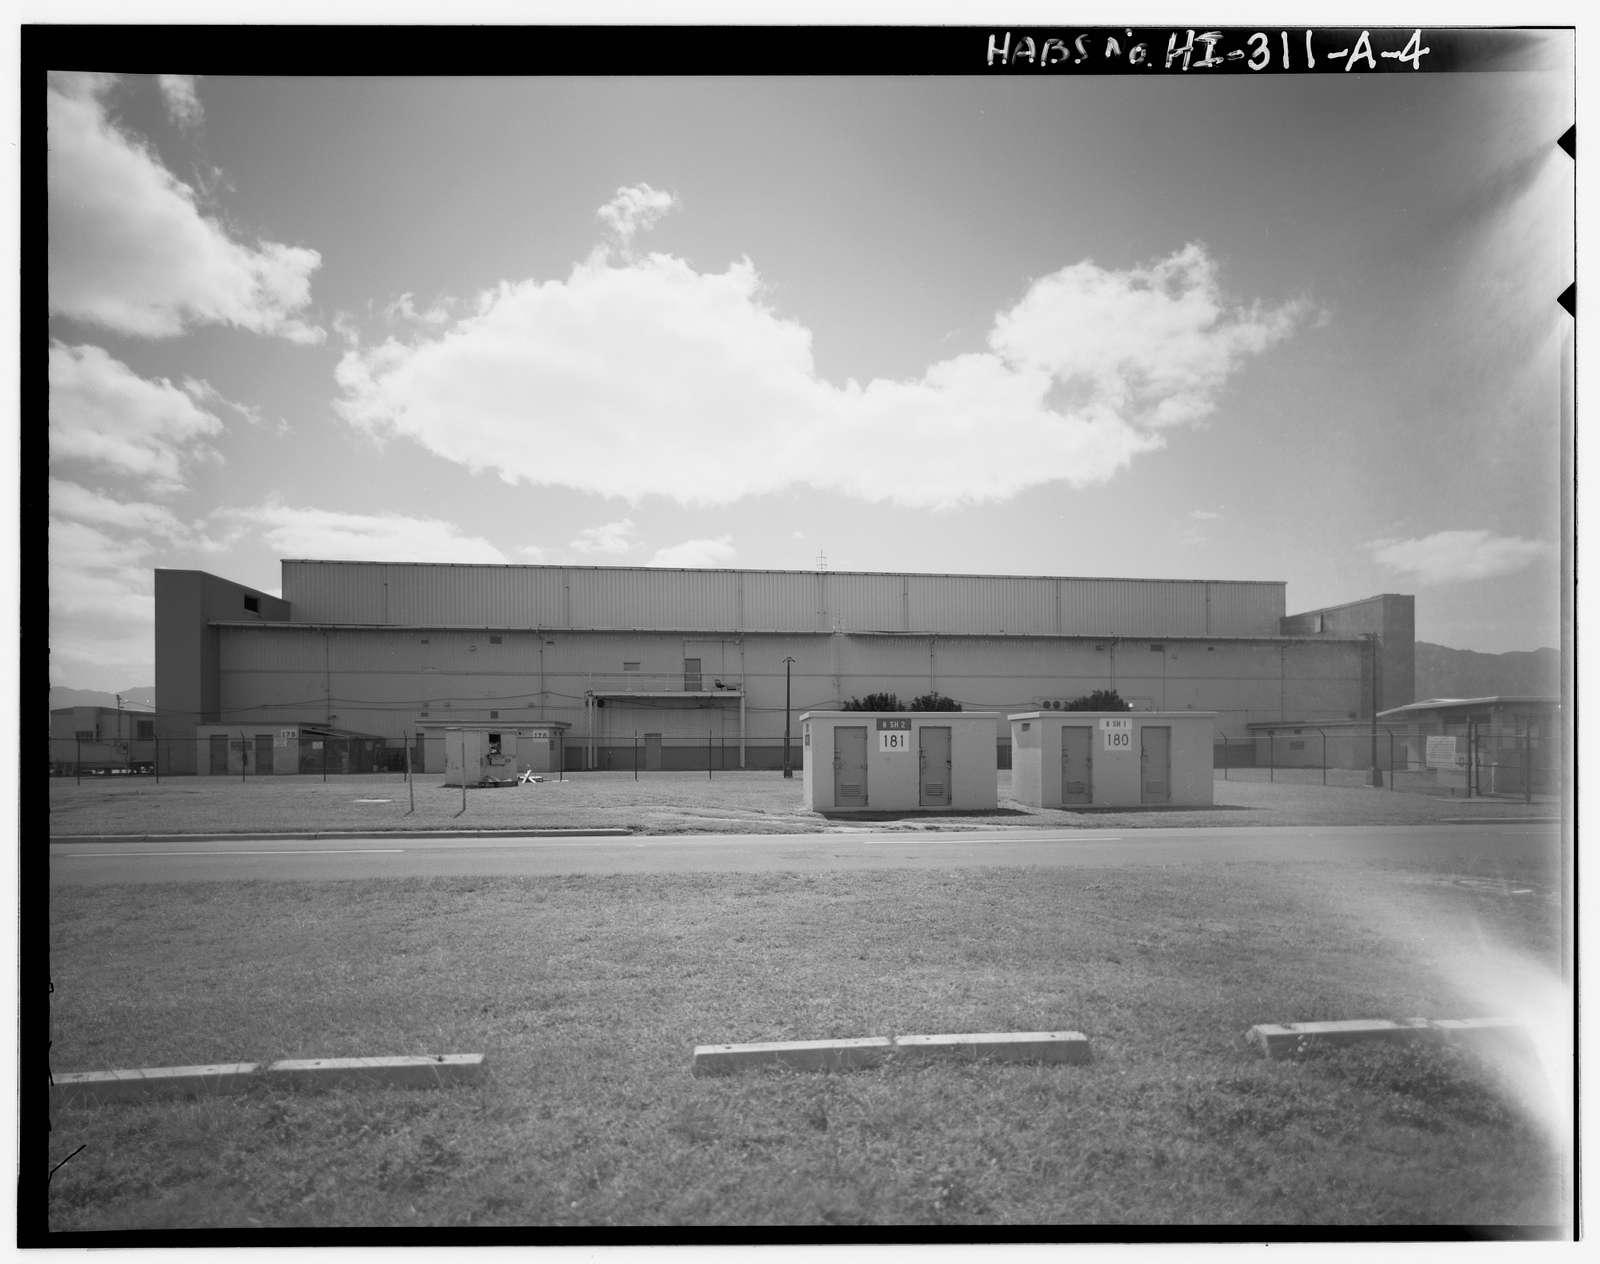 U.S. Marine Corps Base Hawaii, Kaneohe Bay, Hangar No. 4, First Street between A & B Streets, Kailua, Honolulu County, HI